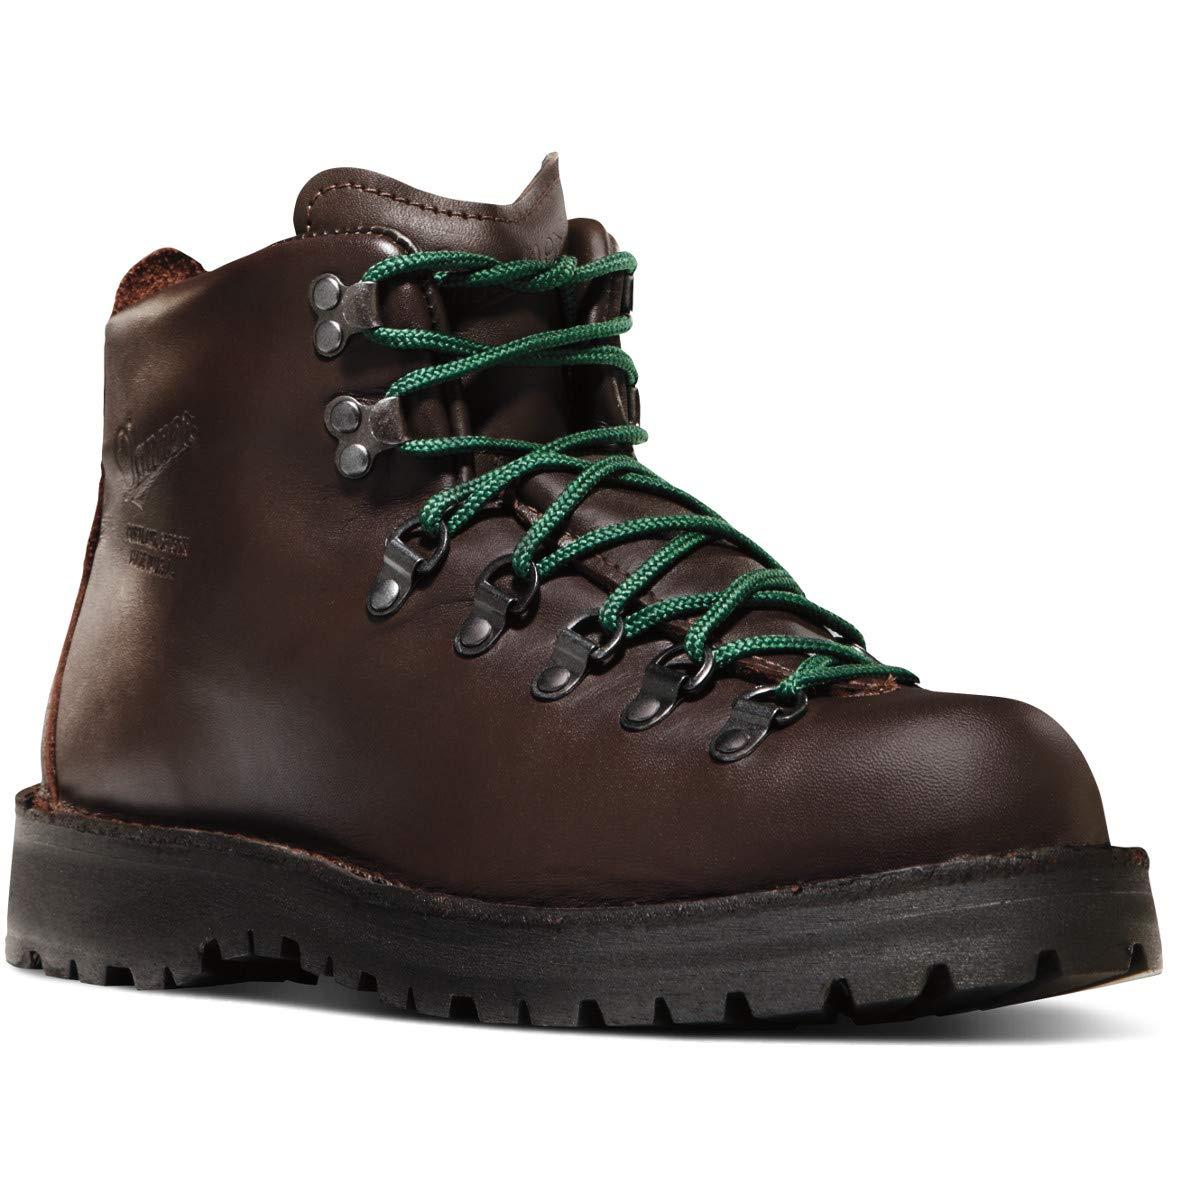 "Danner Women's Mountain Light II 5"" Gore-Tex Hiking Boot"